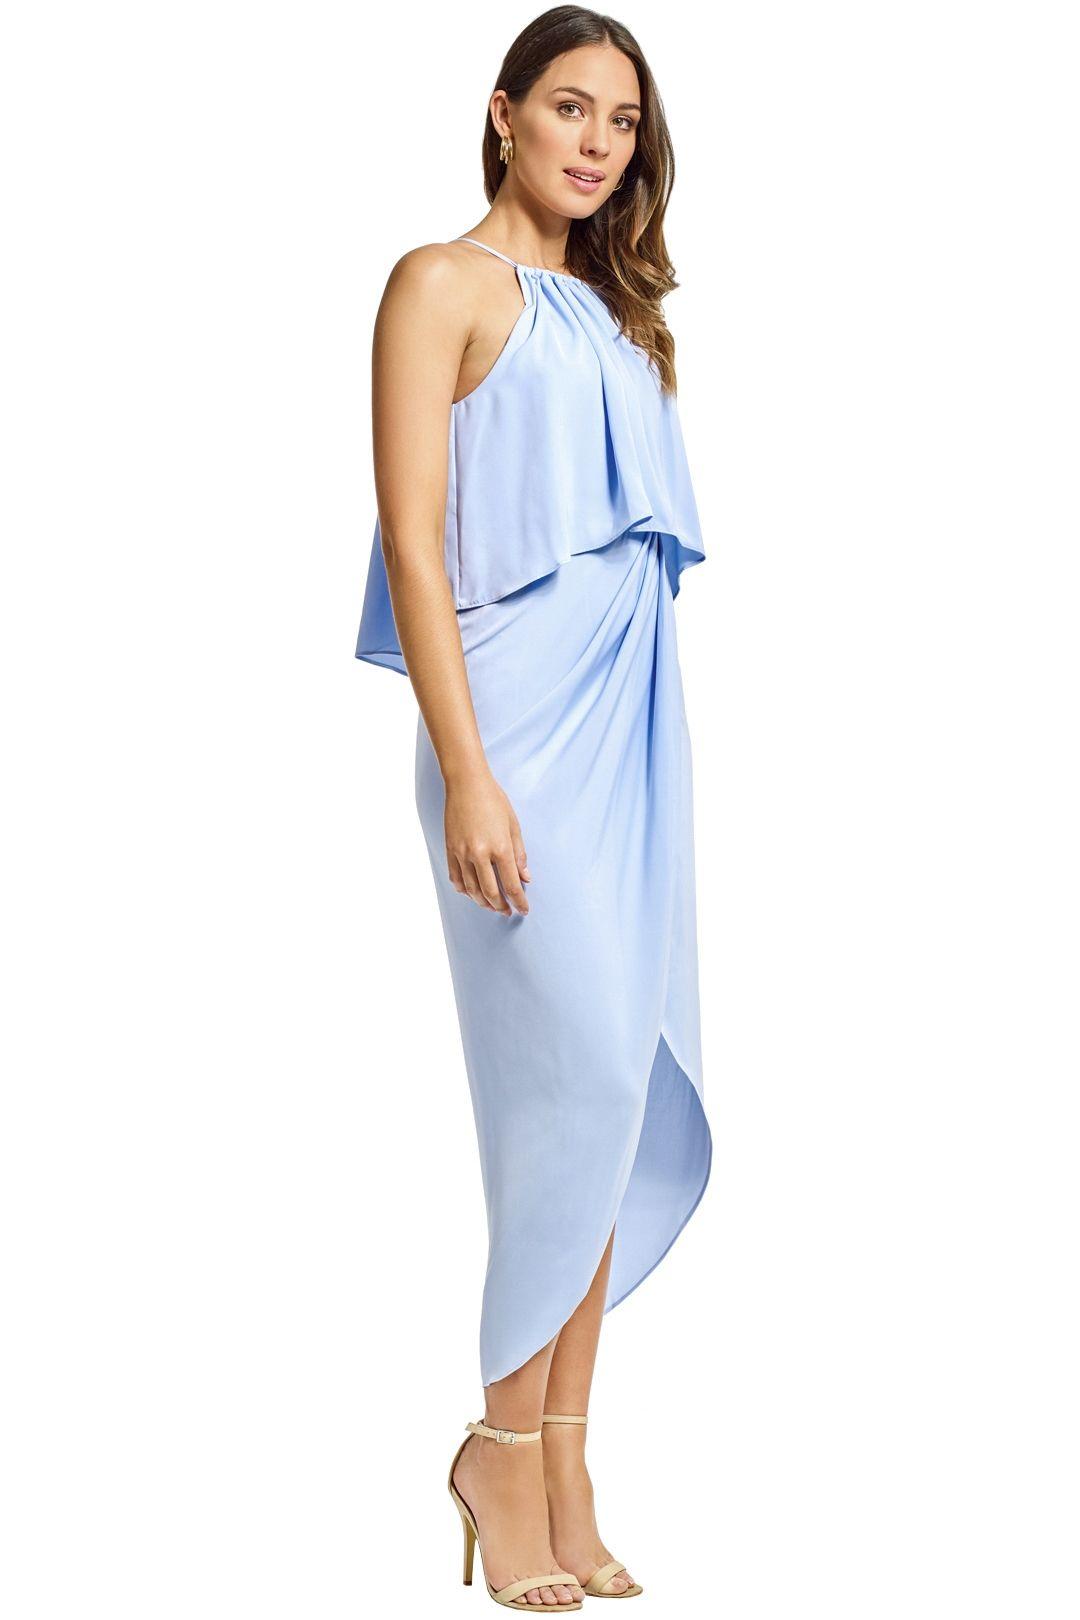 Shona Joy - Frill High Neck Drape Maxi Dress - Cornflower Blue - Side